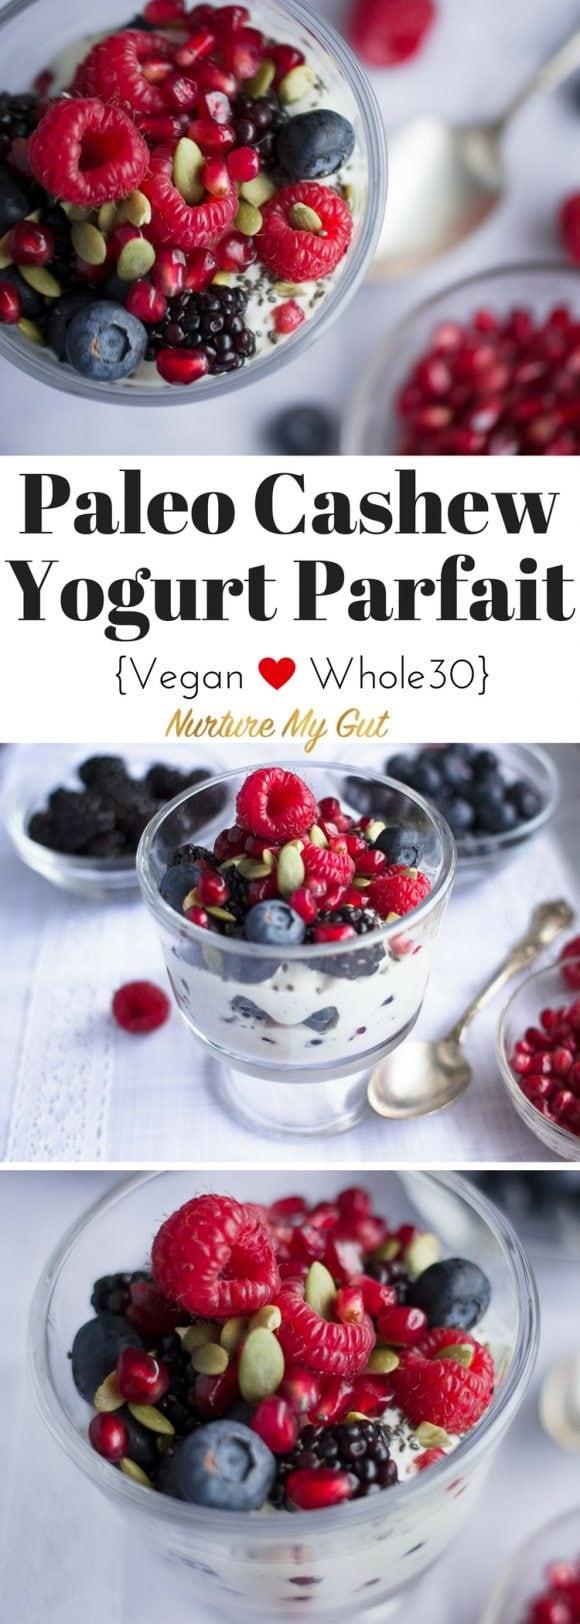 Paleo Cashew Yogurt Parfait